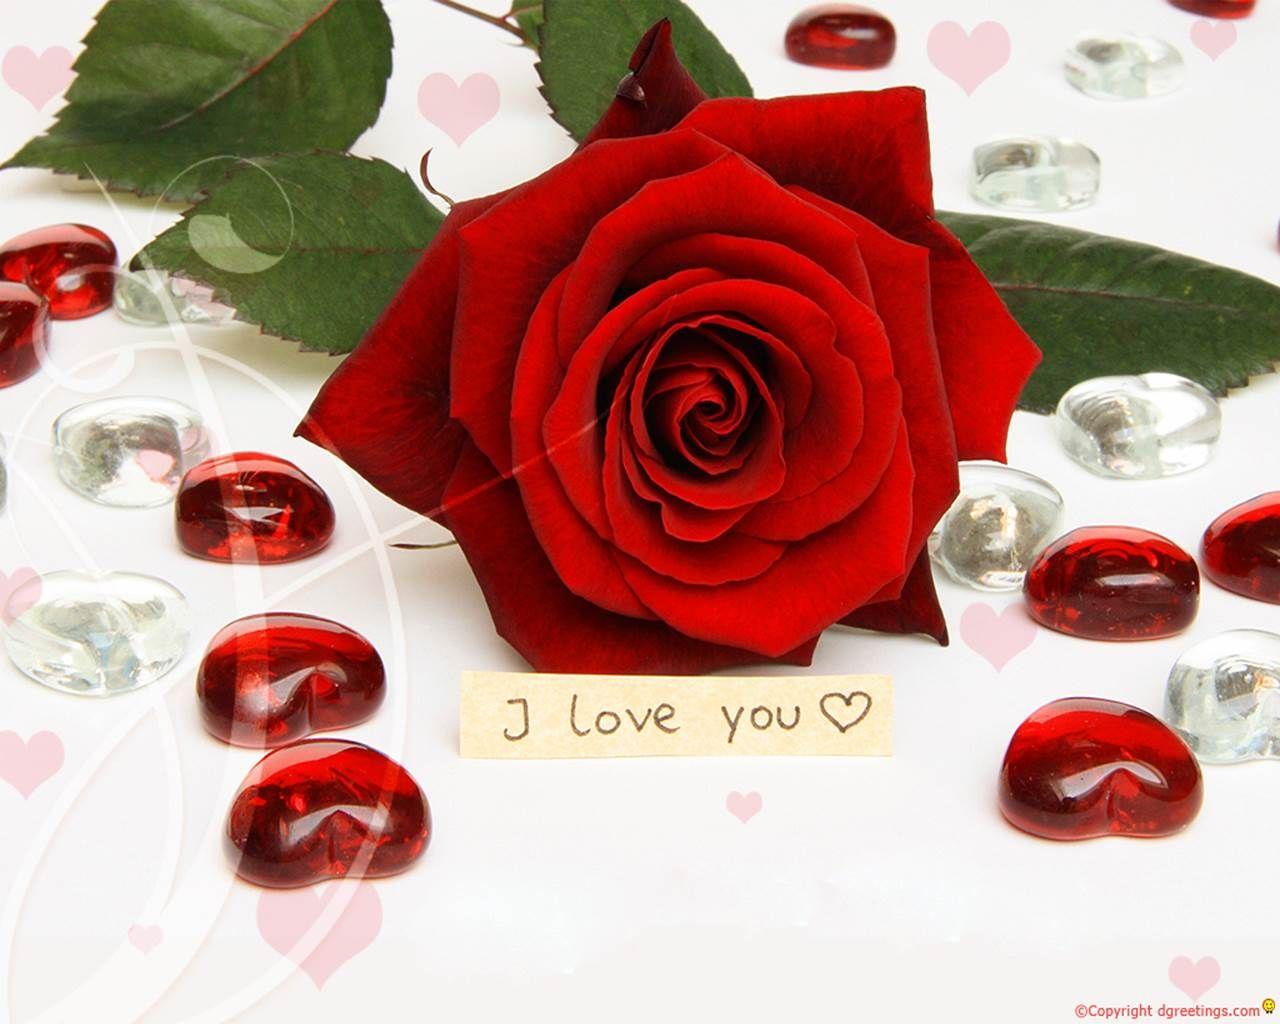 Wallpaper download new love - Sexy Love Hd Desktop Wallpaper High Definition Fullscreen Mobile 1280 1024 New